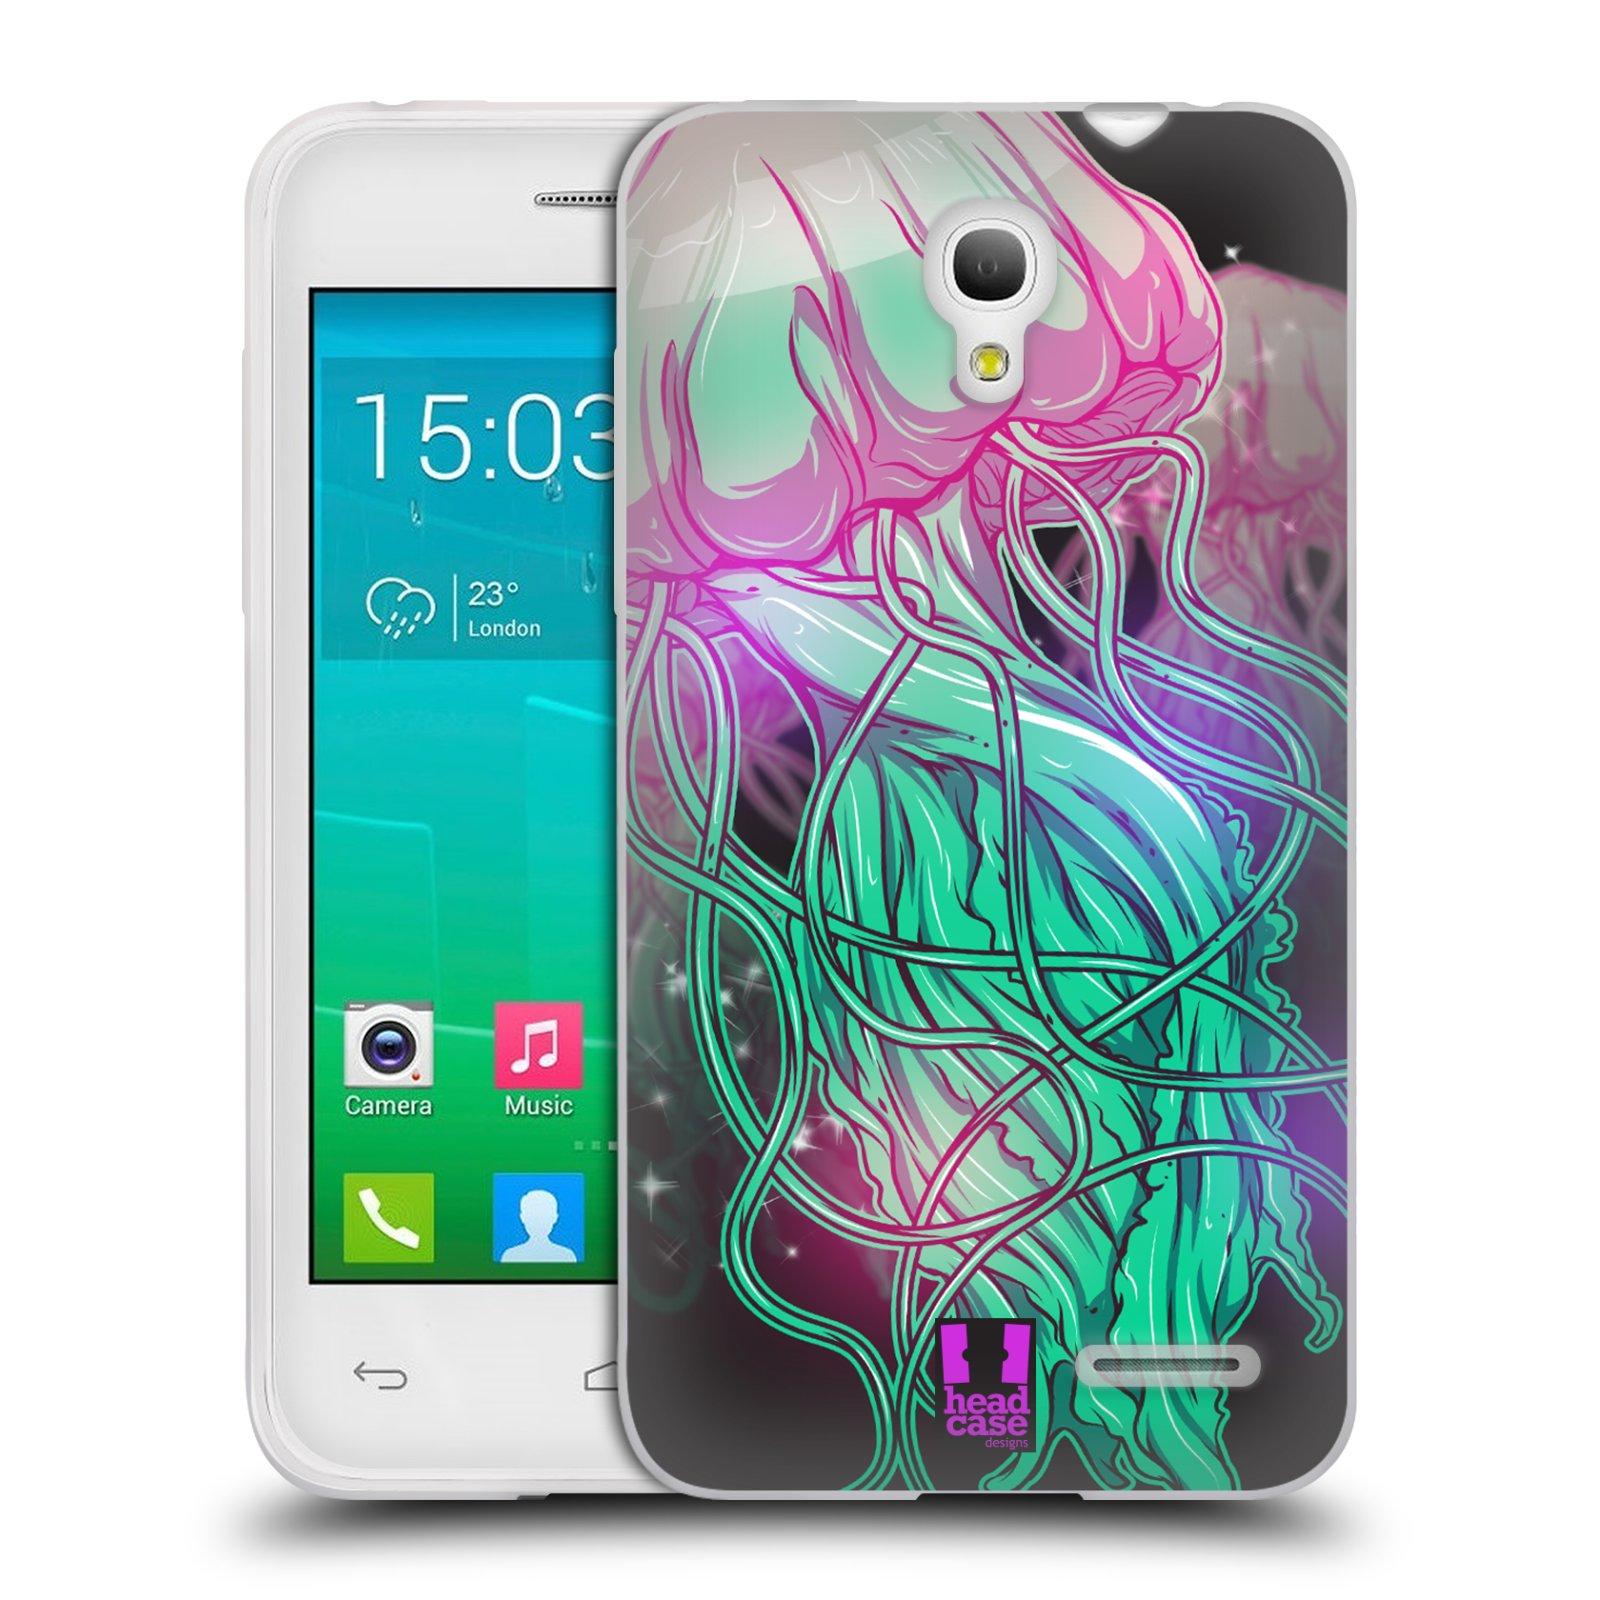 HEAD CASE silikonový obal na mobil Alcatel POP S3 OT-5050Y vzor mořská monstra medůza